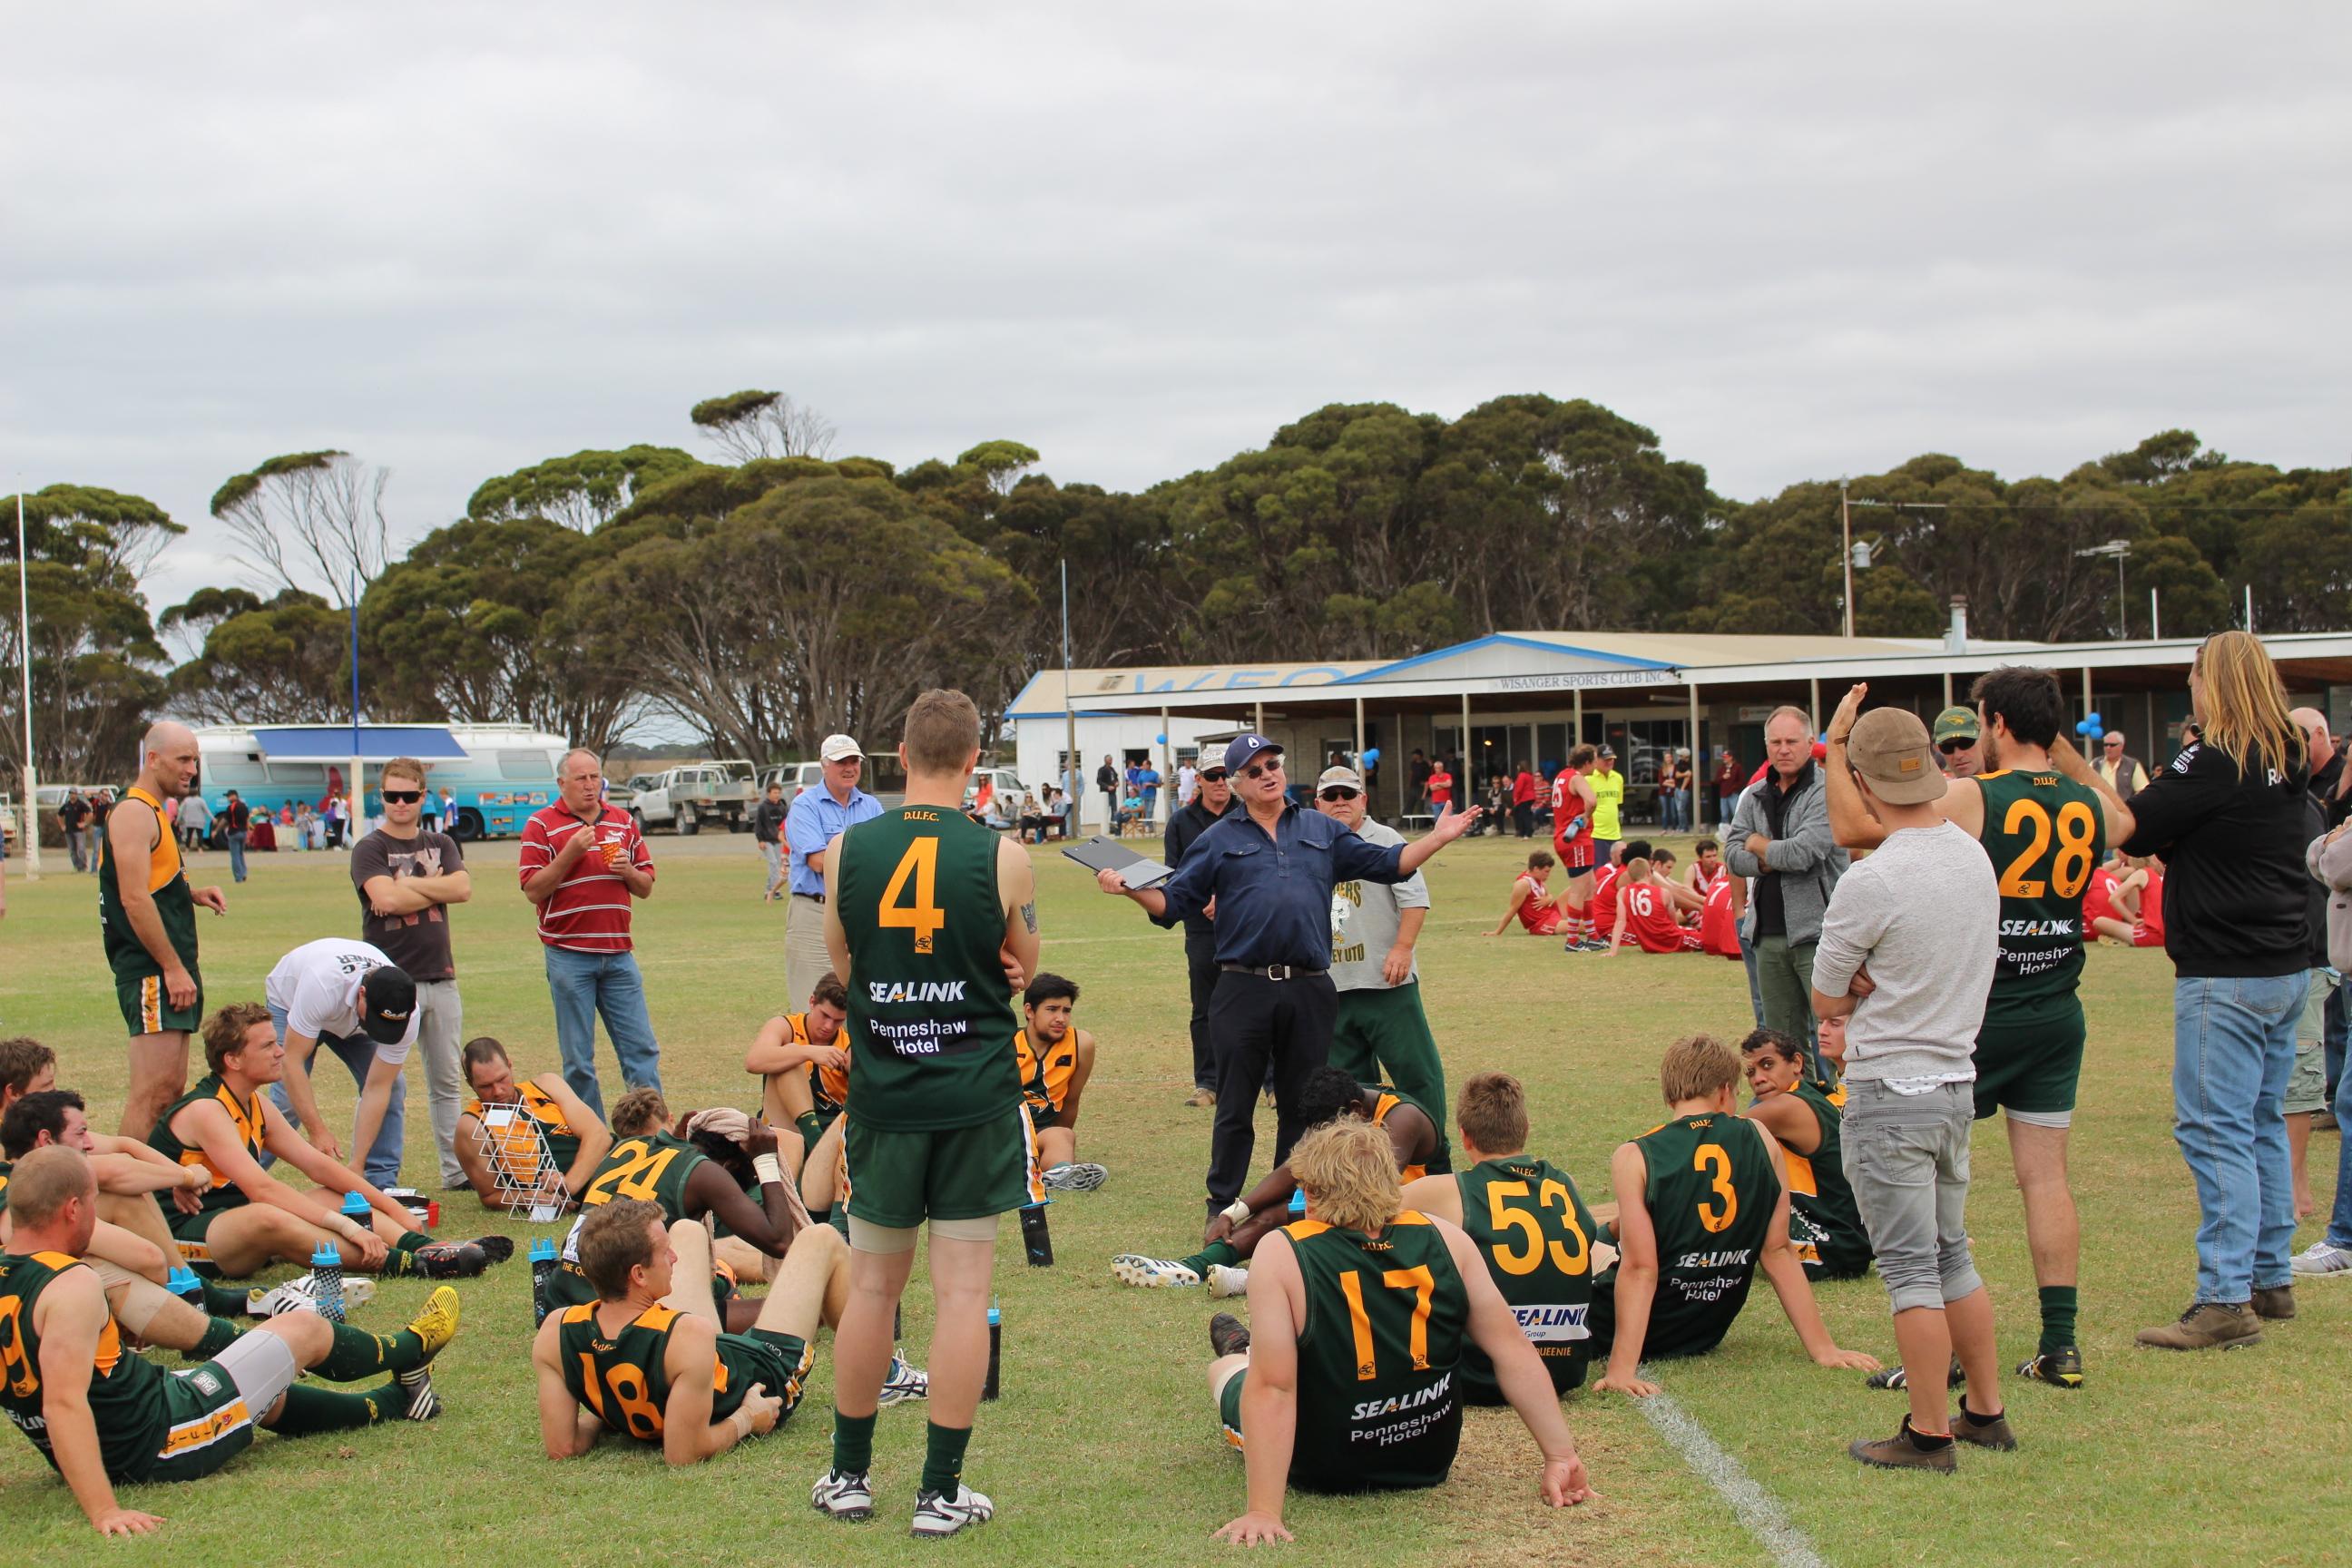 Taking a break - round 1 of Kangaroo Island Football League.